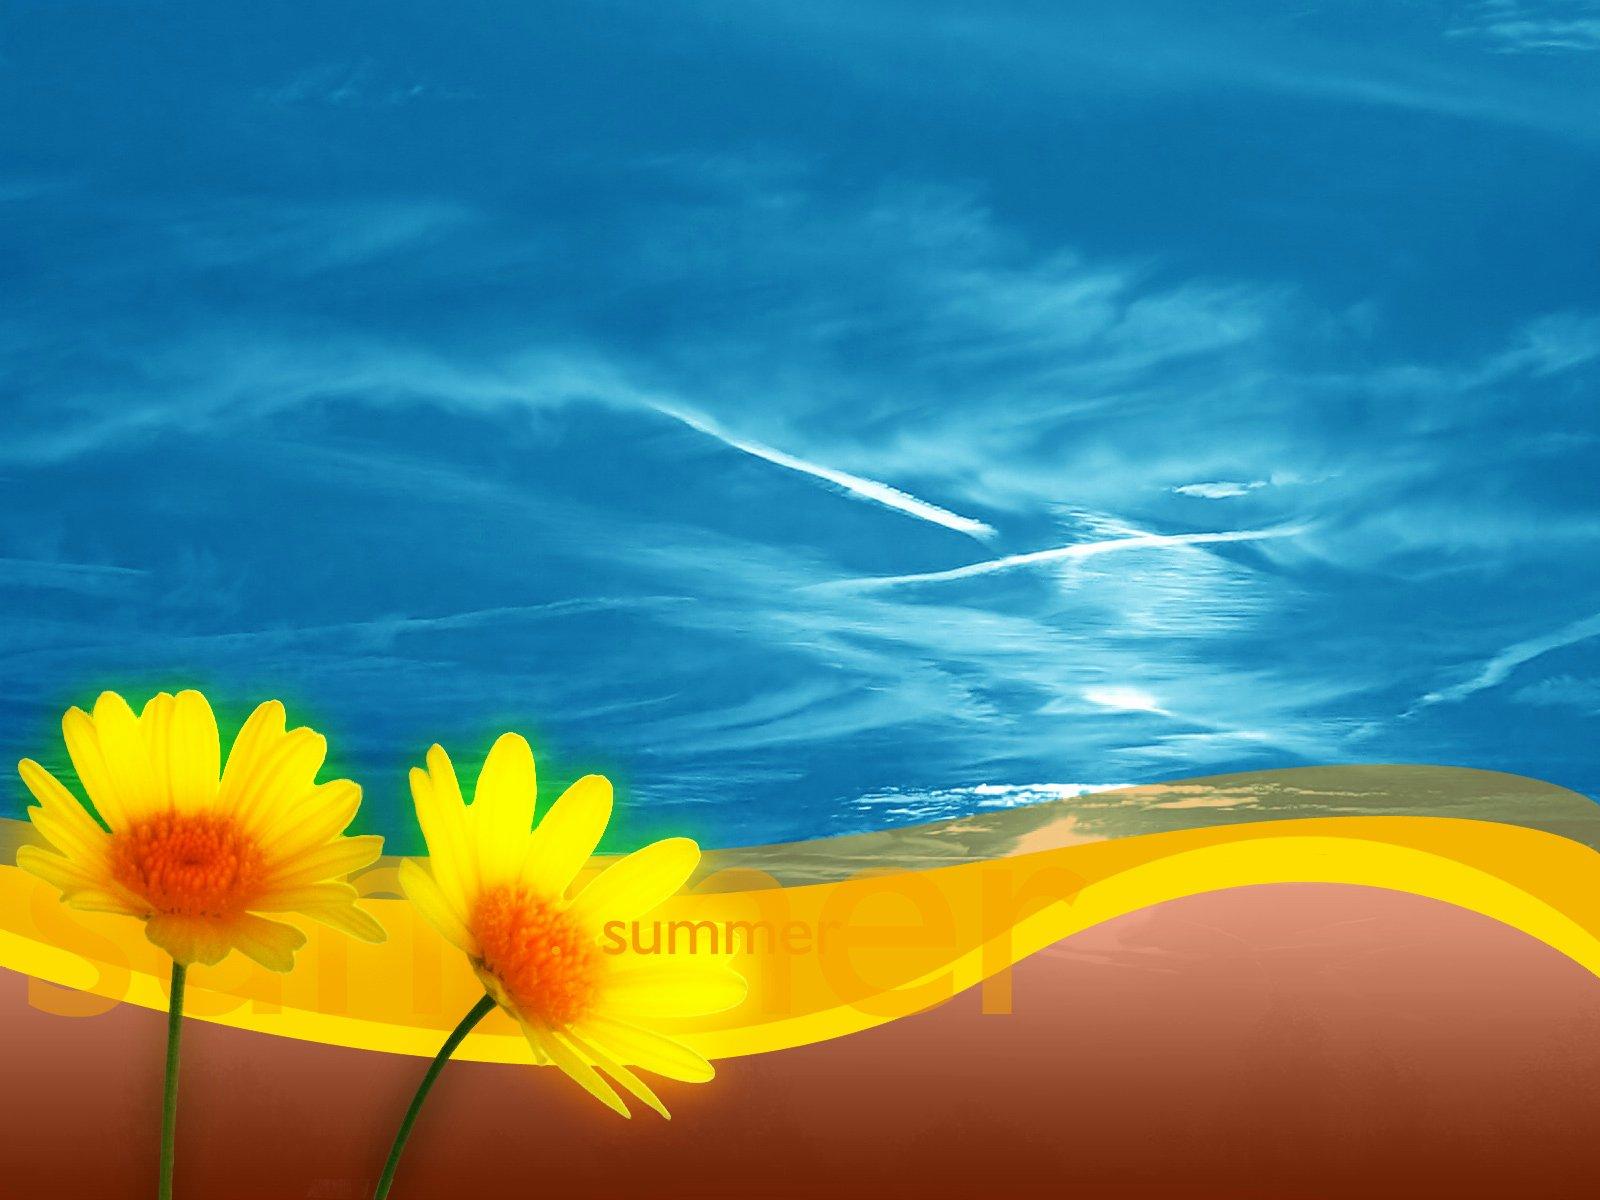 Free Summer Background Images Awesome Summer Wallpaper Hd for Desktop